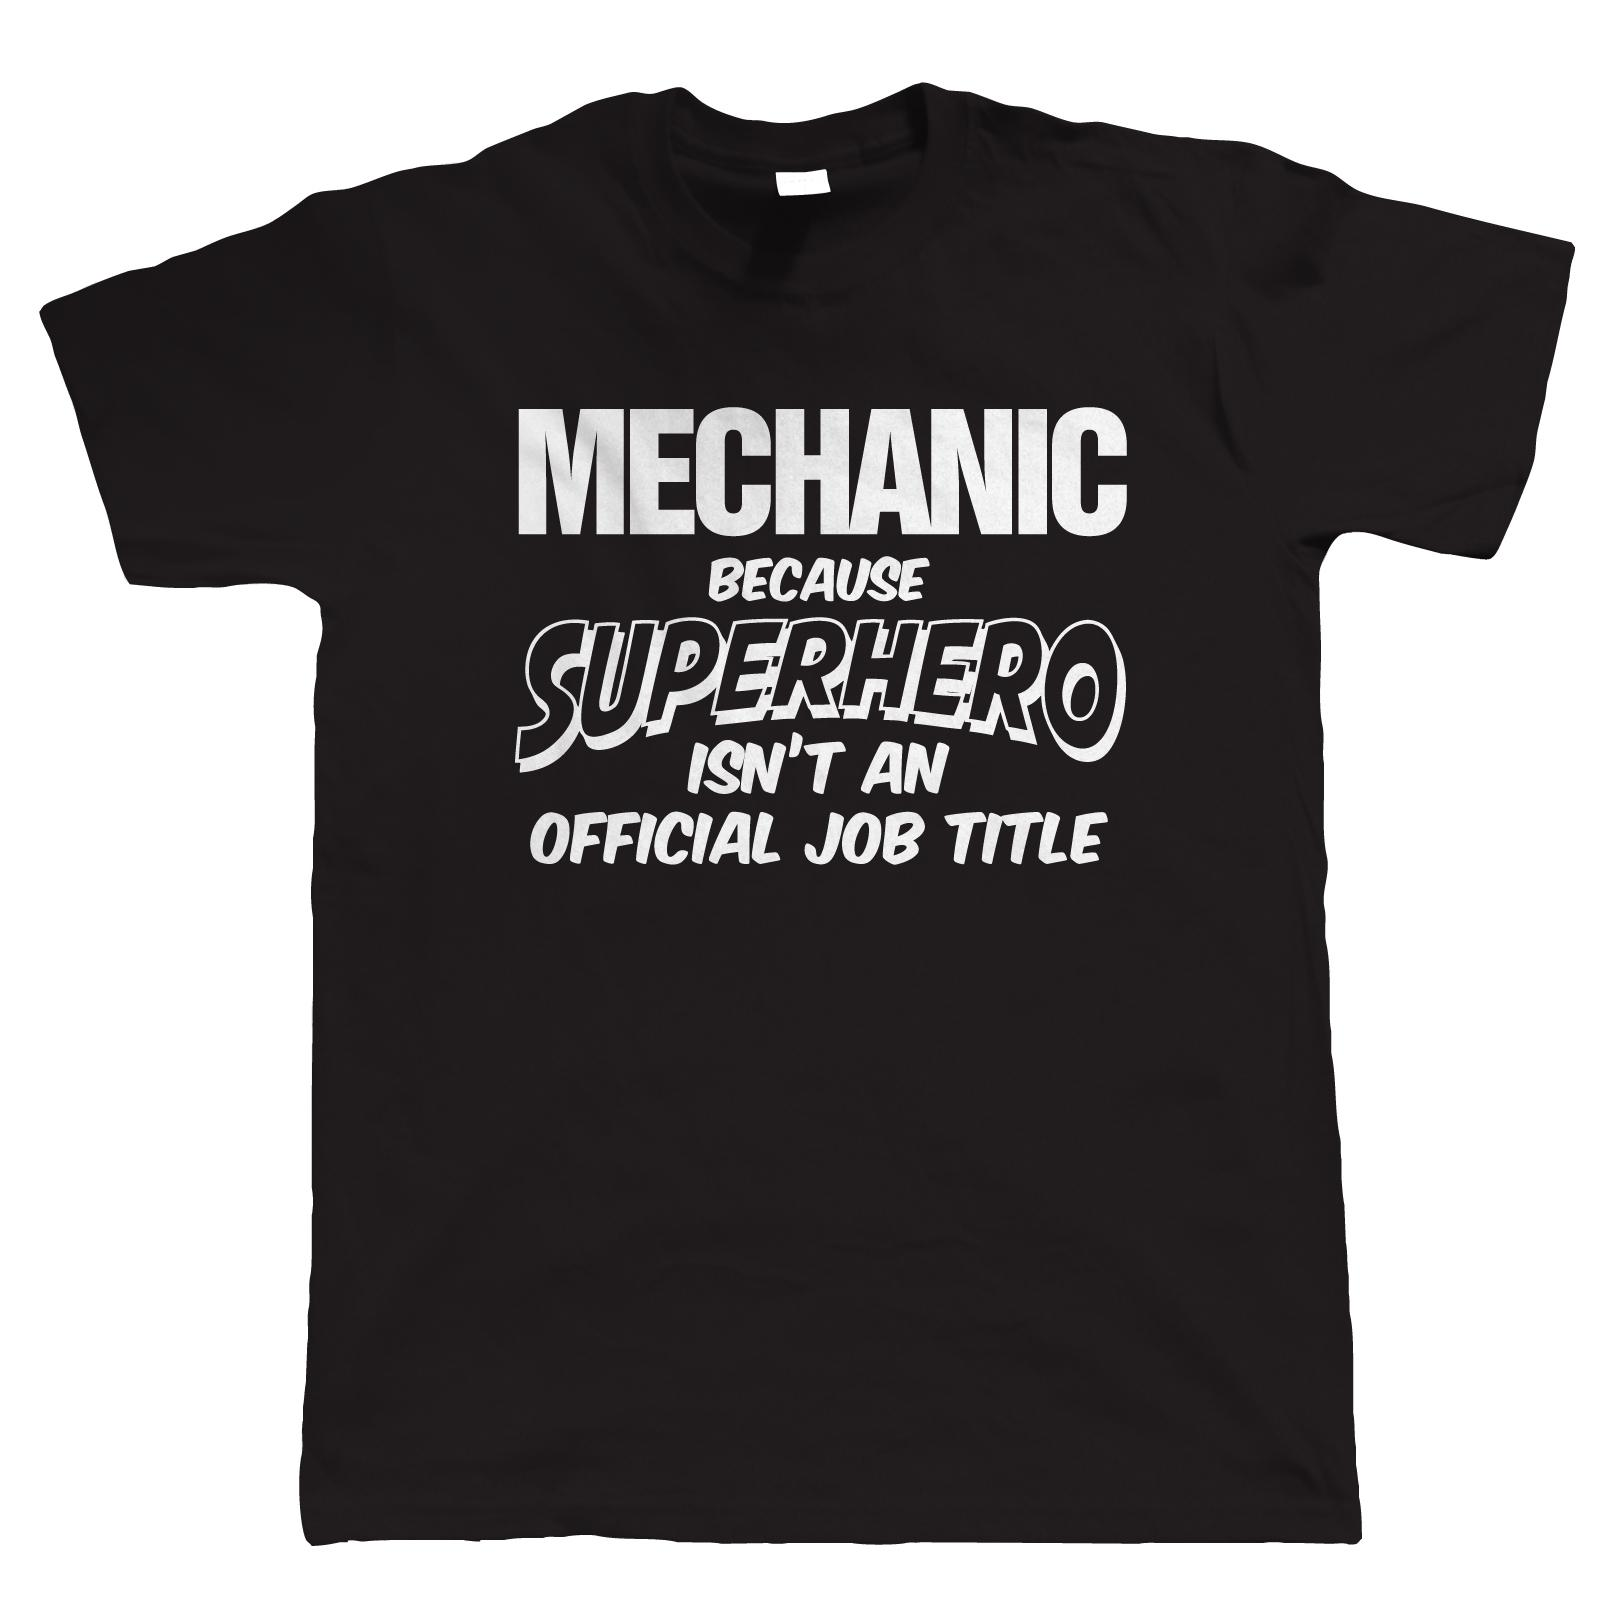 Mechanic Superhero Mens Funny T Shirt Birthday Gift For Dad Him